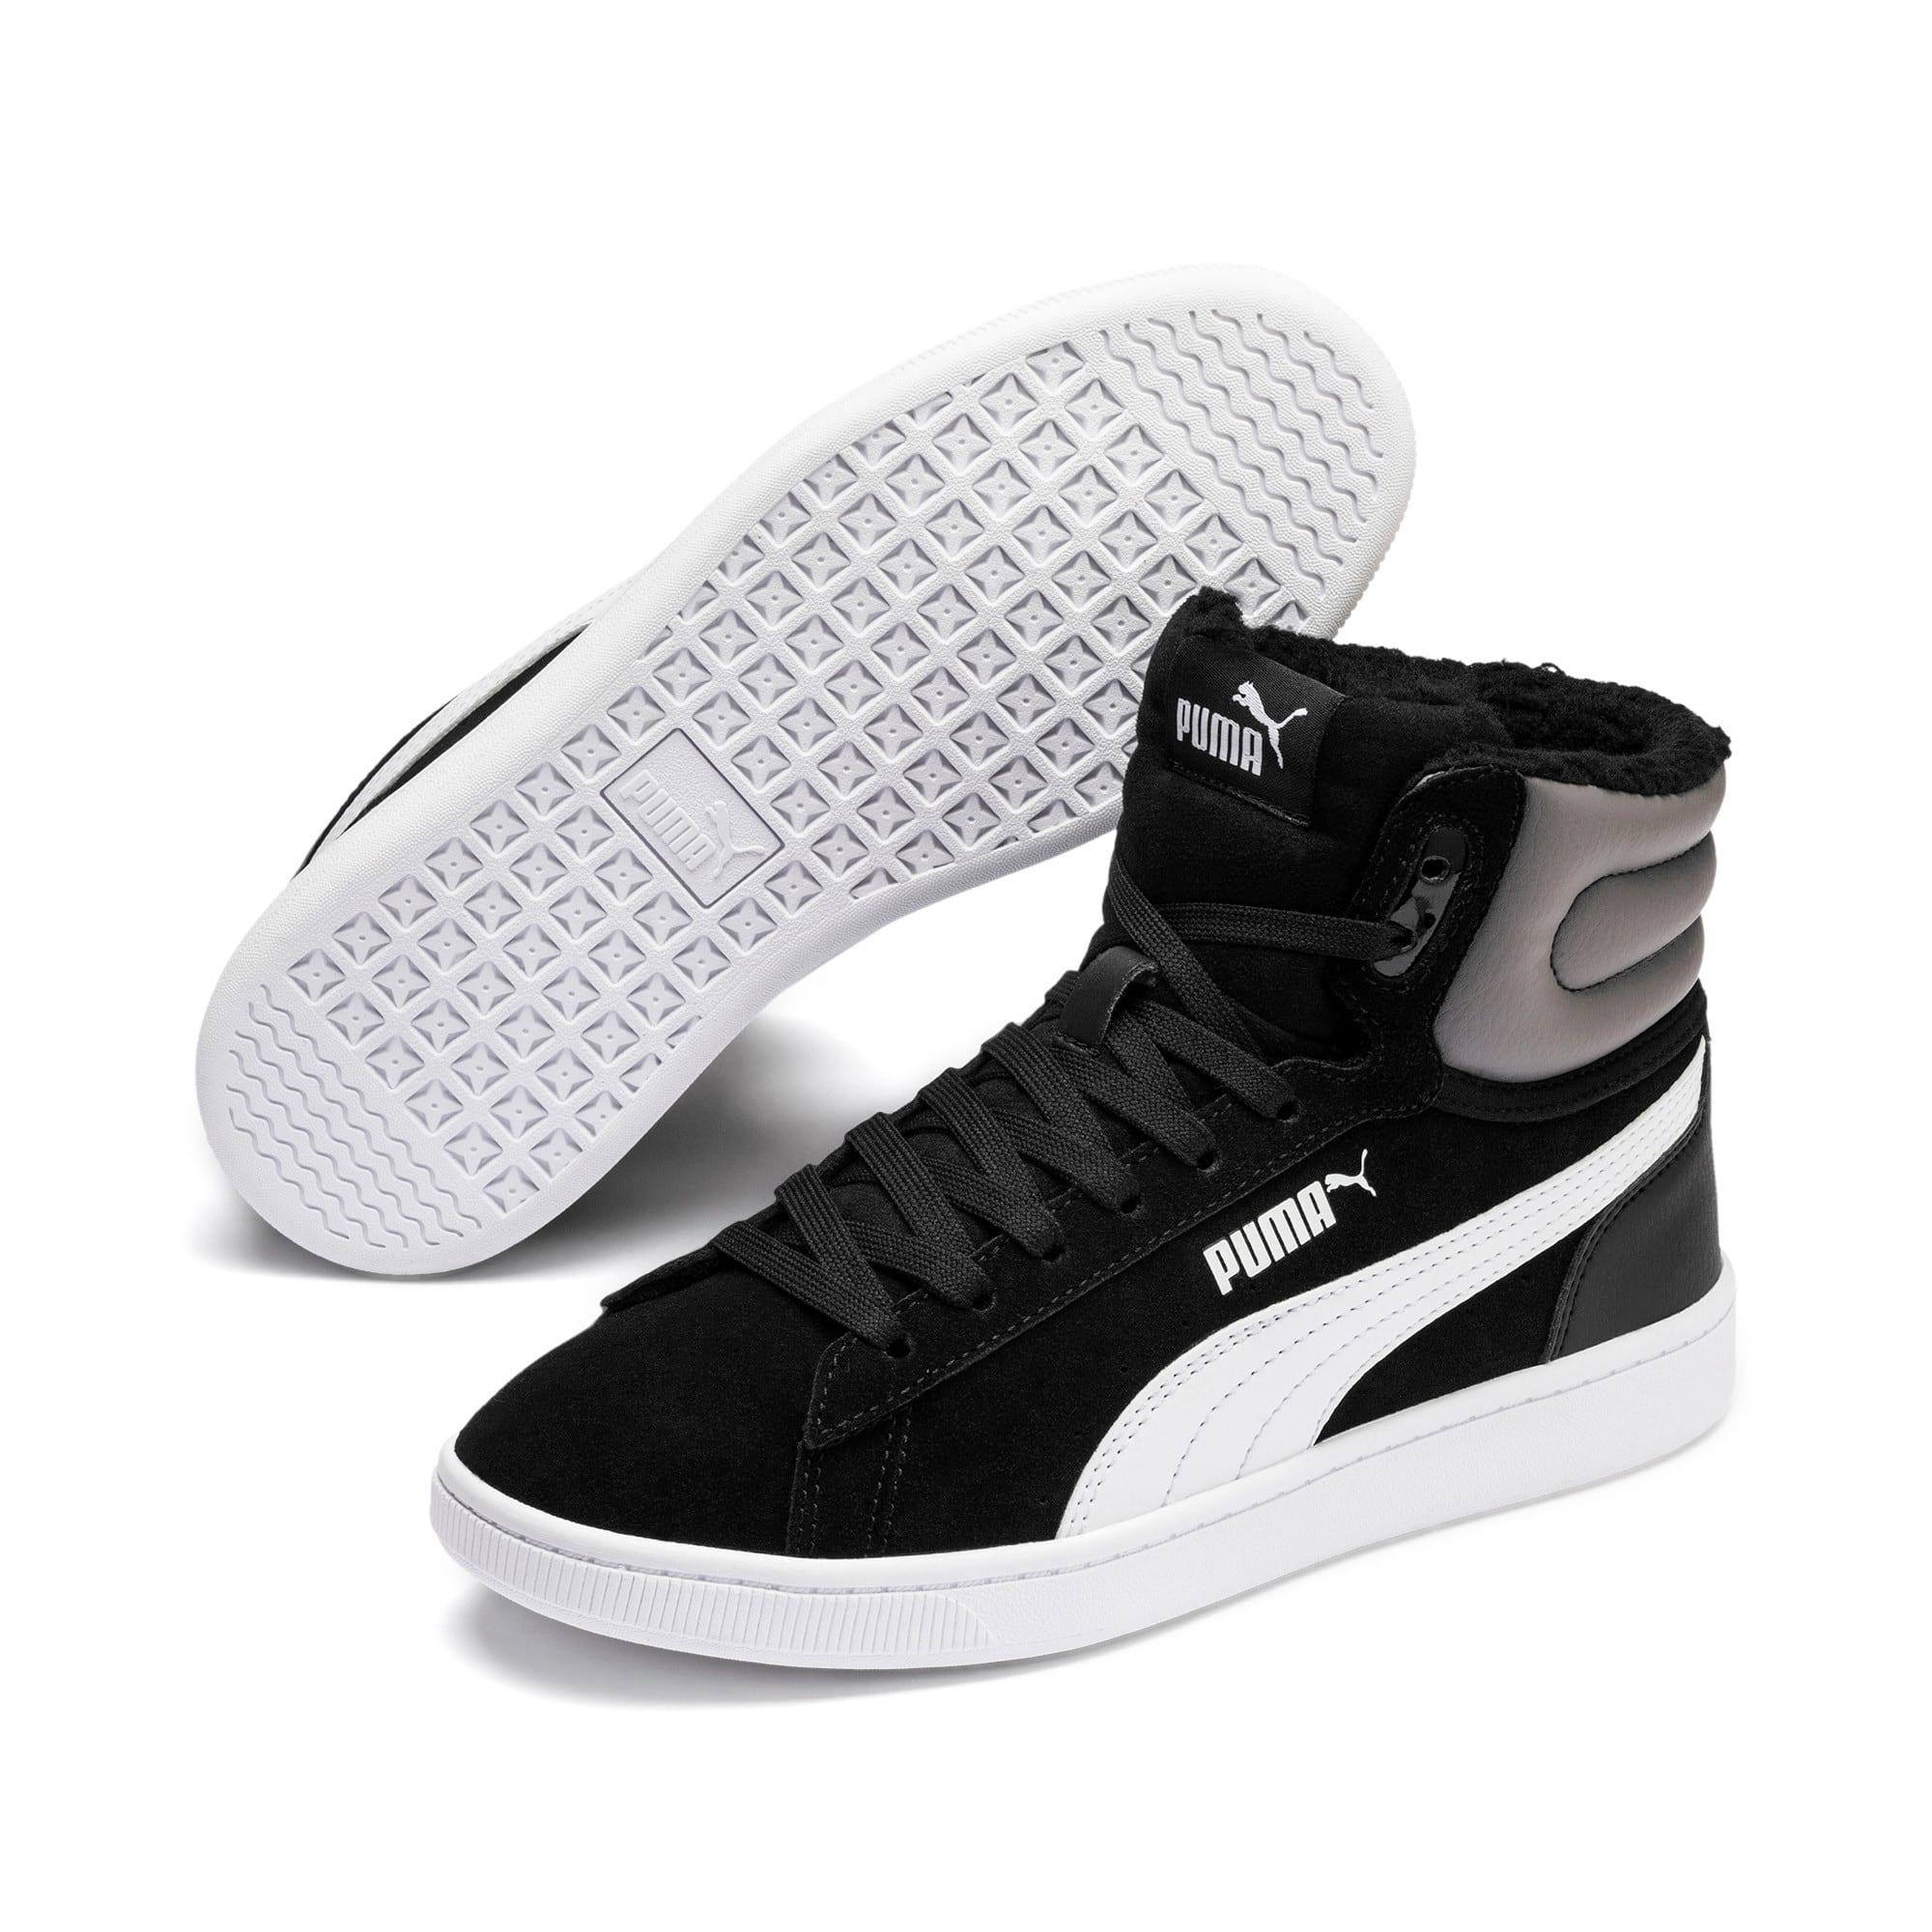 Thumbnail 2 of Vikky v2 Mid Fur Youth Mädchen Sneaker, Puma Black-CASTLEROCK-White, medium